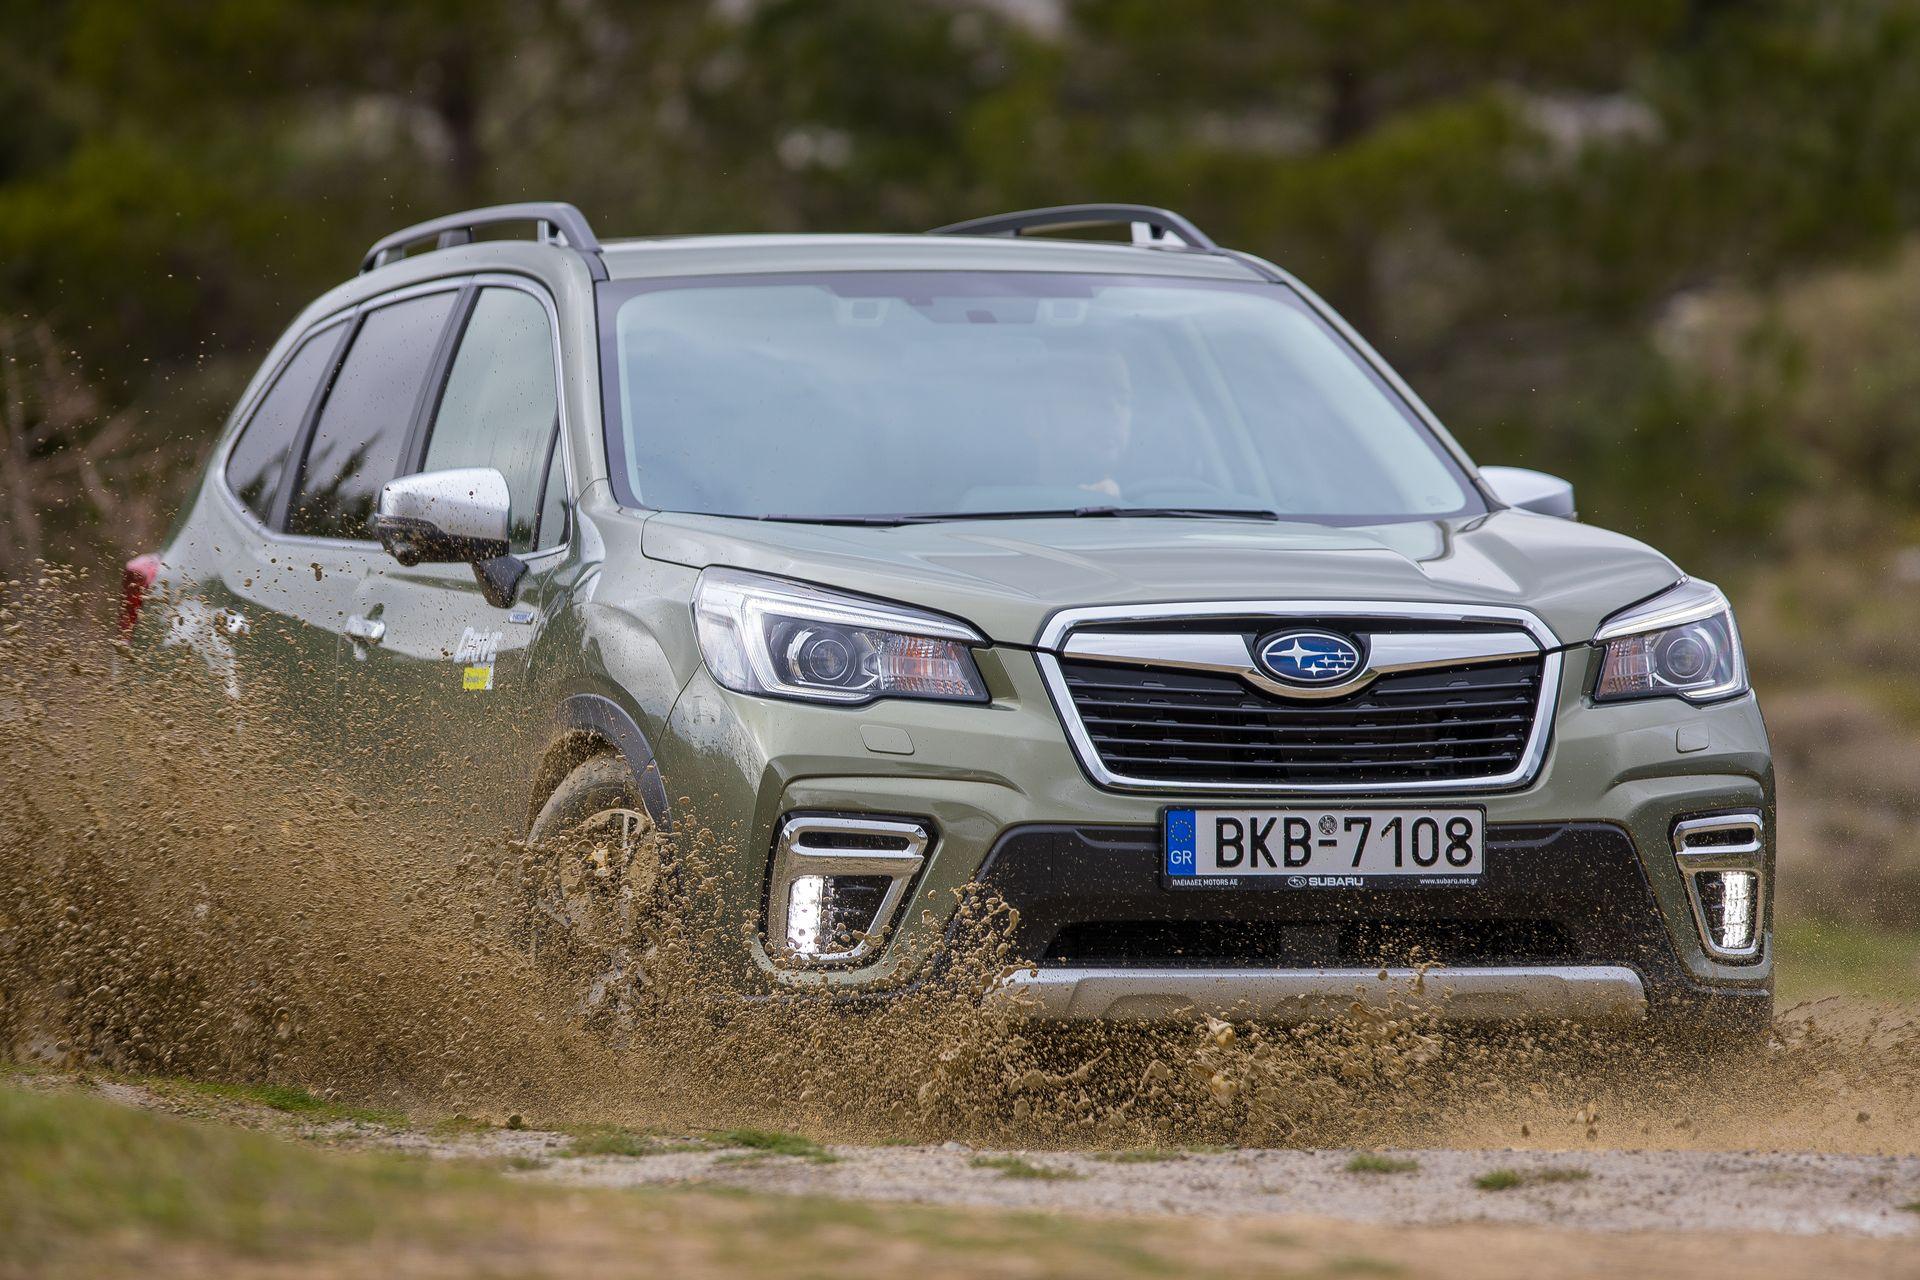 Subaru: Παραμένει στην Ευρώπη παρά τις χαμηλές πωλήσεις του 2020